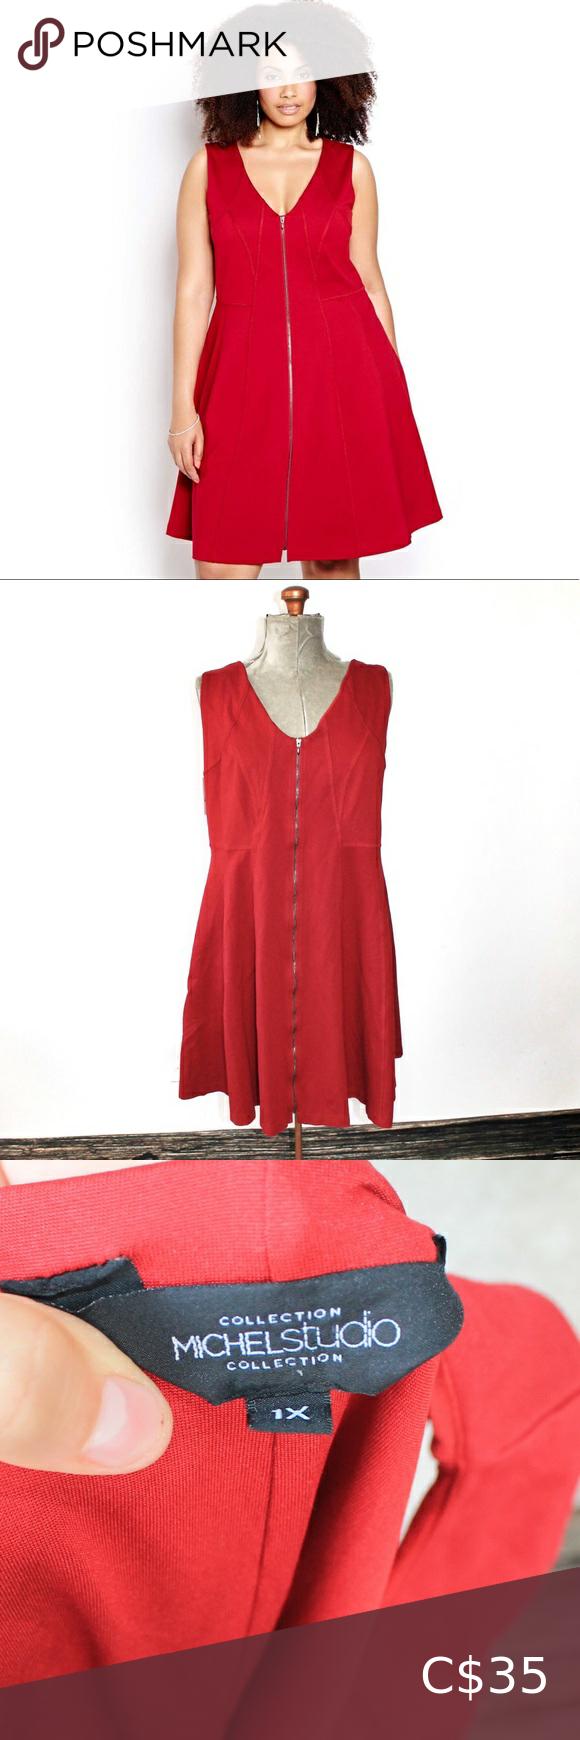 NWT Michel Studio Red Zip Up Dress Size 1X